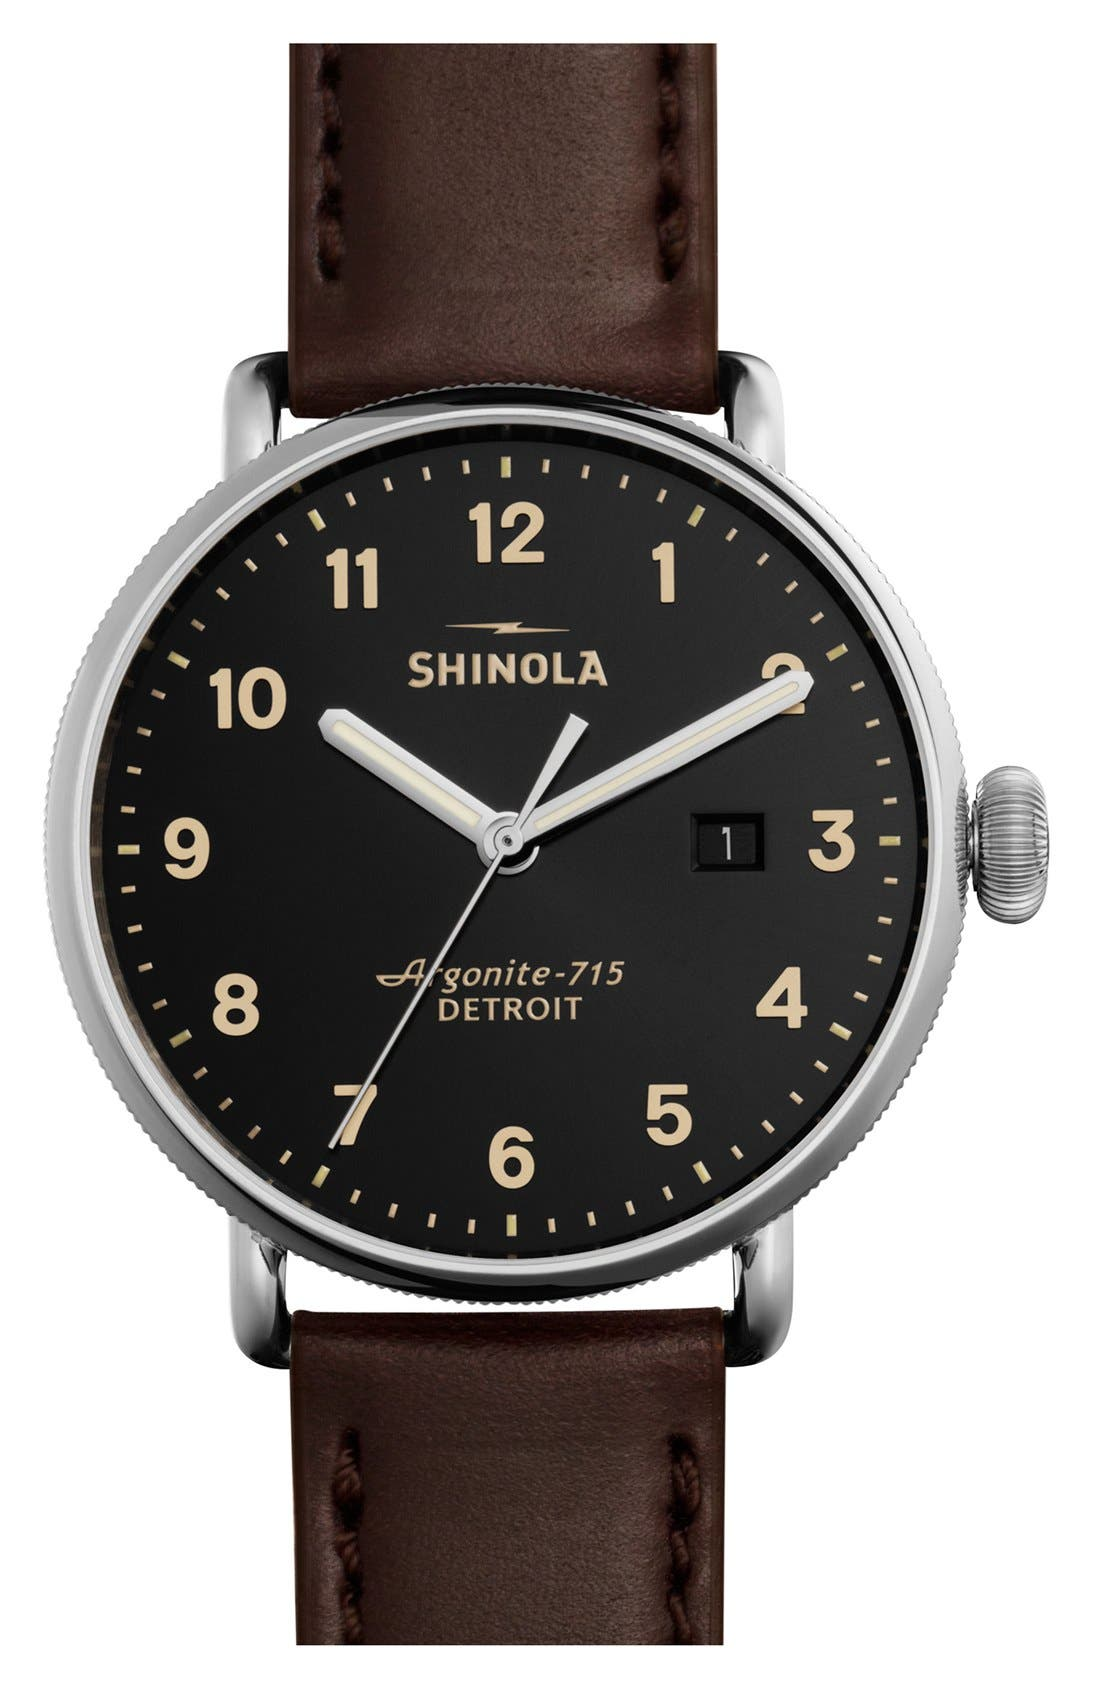 Shinola Men's Canfield Alligator Leather Strap Watch In Black